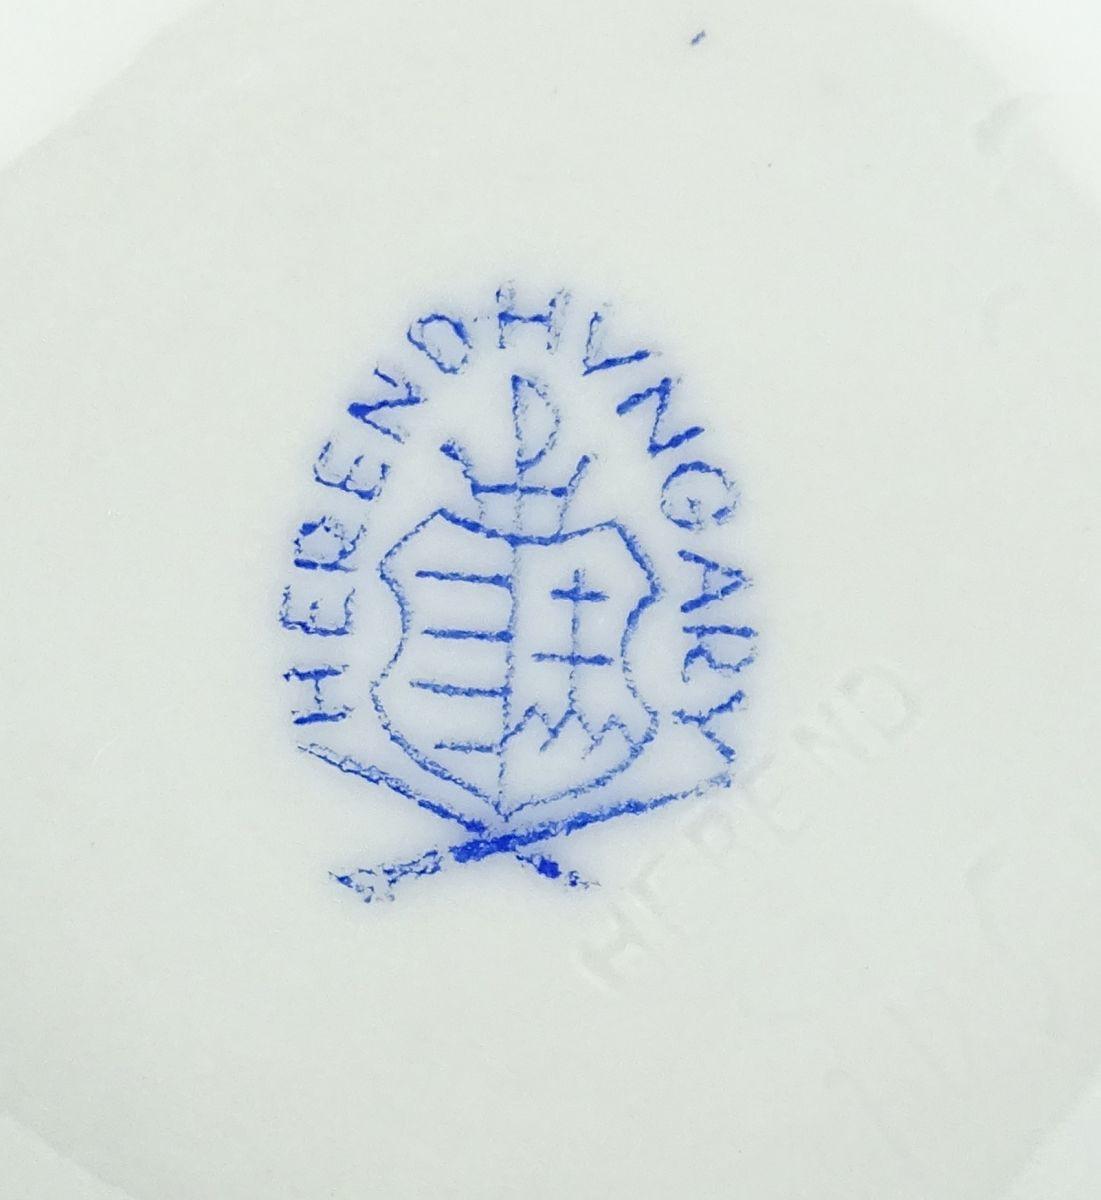 DSC01970.JPG (1101×1200)